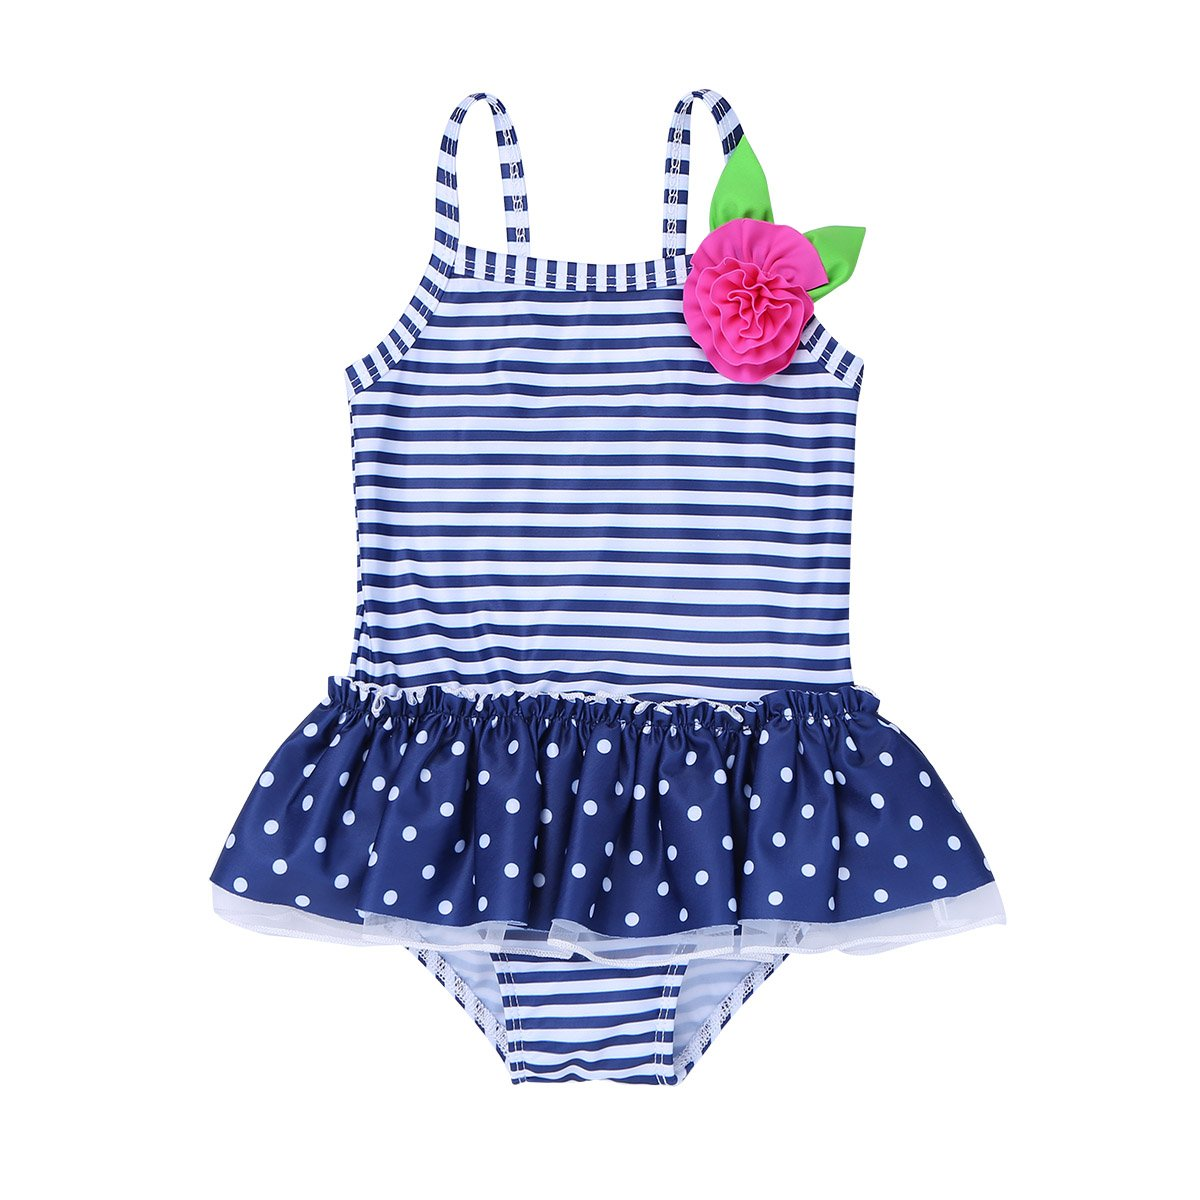 iEFiEL Infant Baby Girls One-Piece Striped Polka Dots Swimsuit Swimwear Bathing Suit